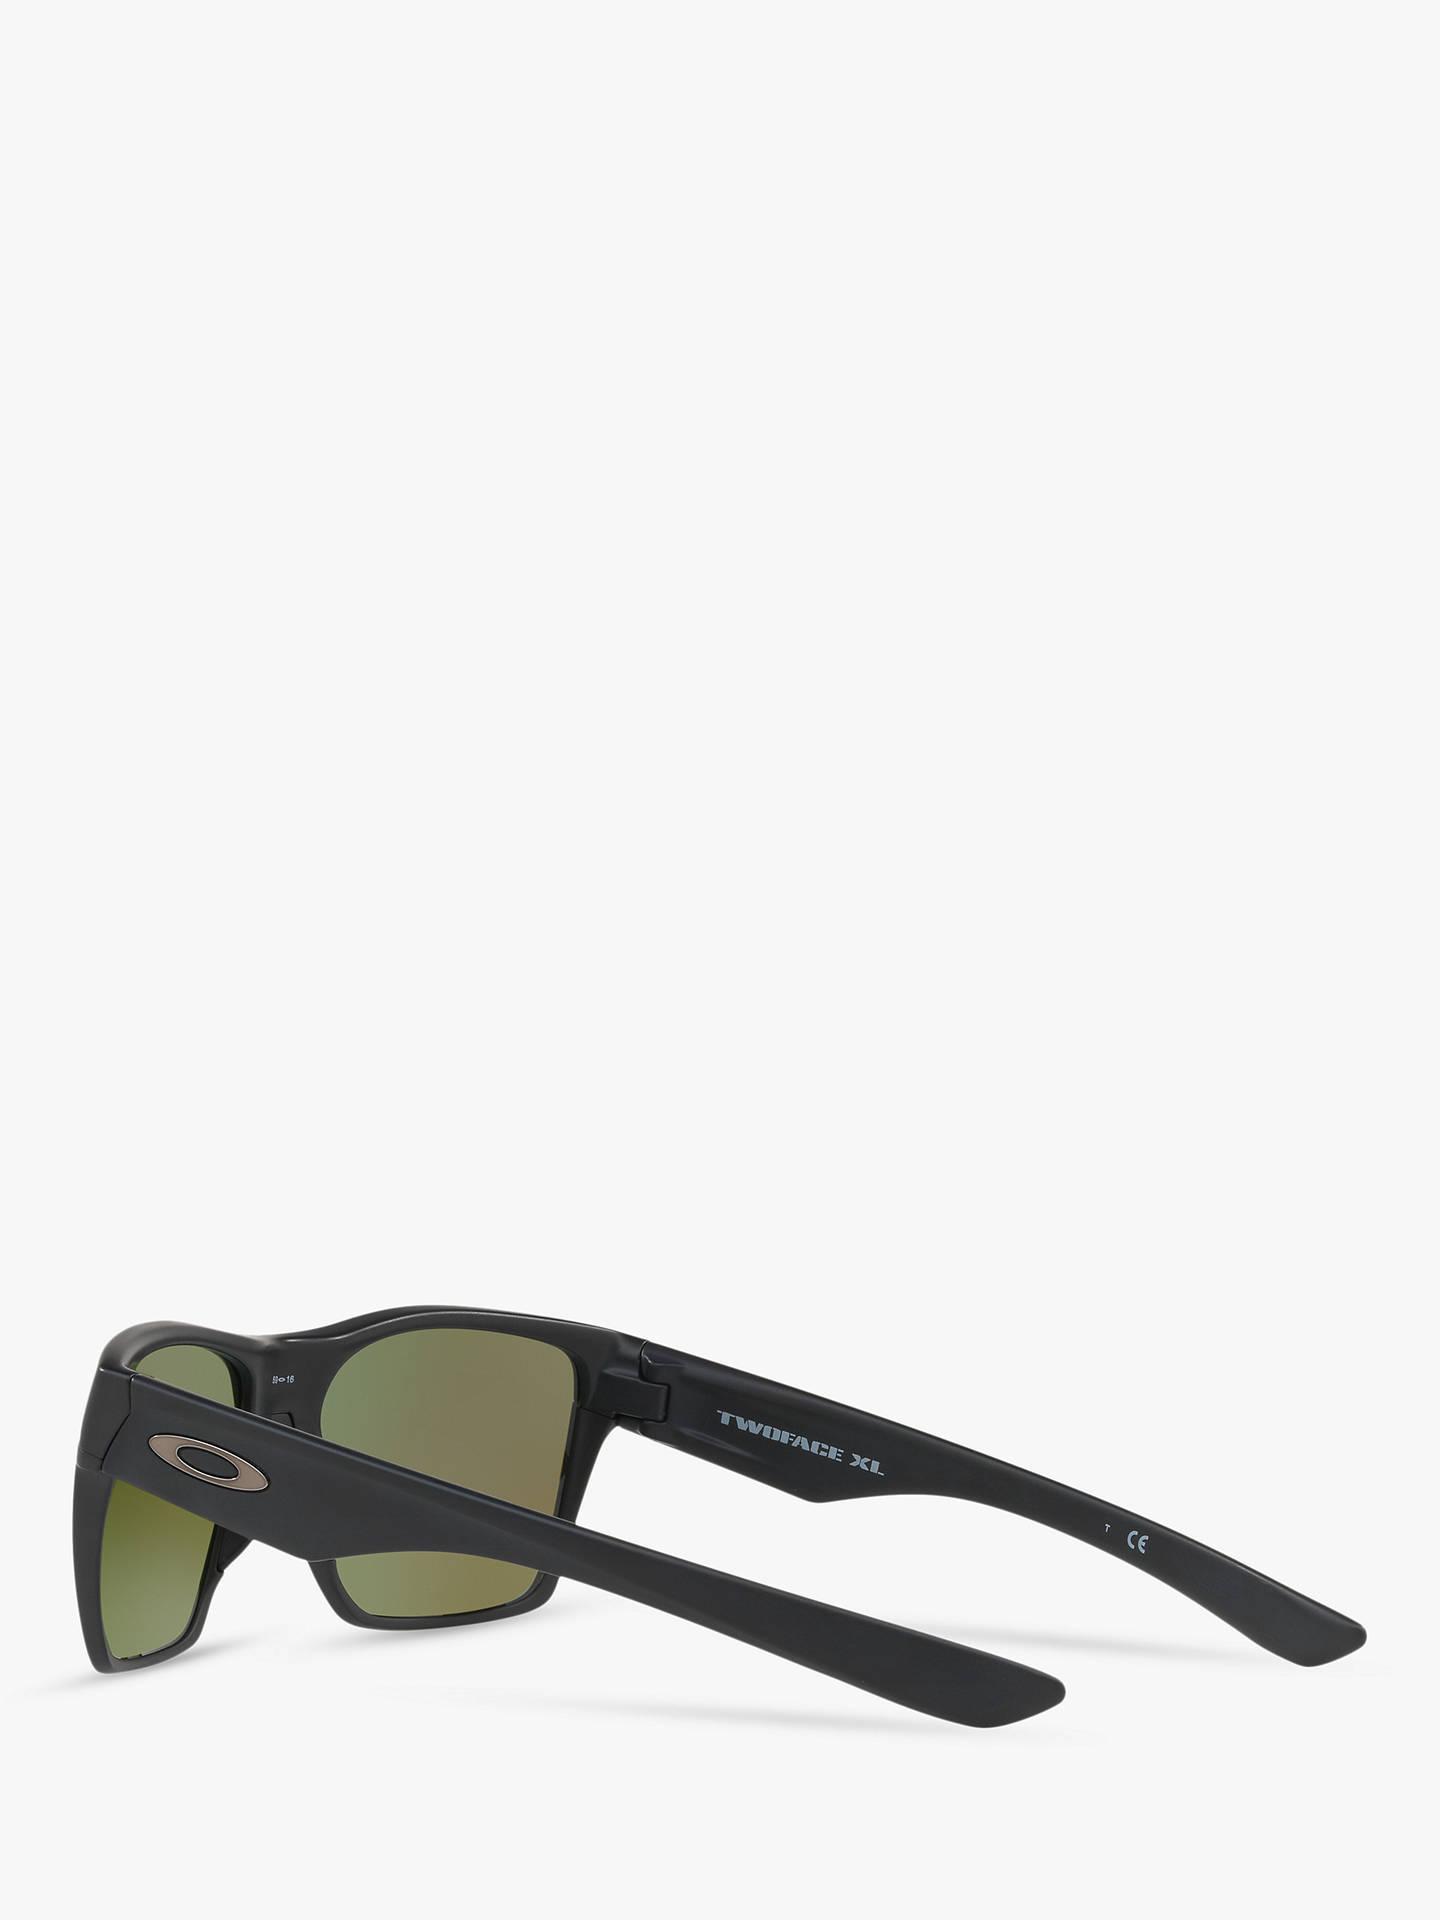 fbaca7c975 Oakley OO9350 Two Face XL Prizm Polarised Square Sunglasses at John ...